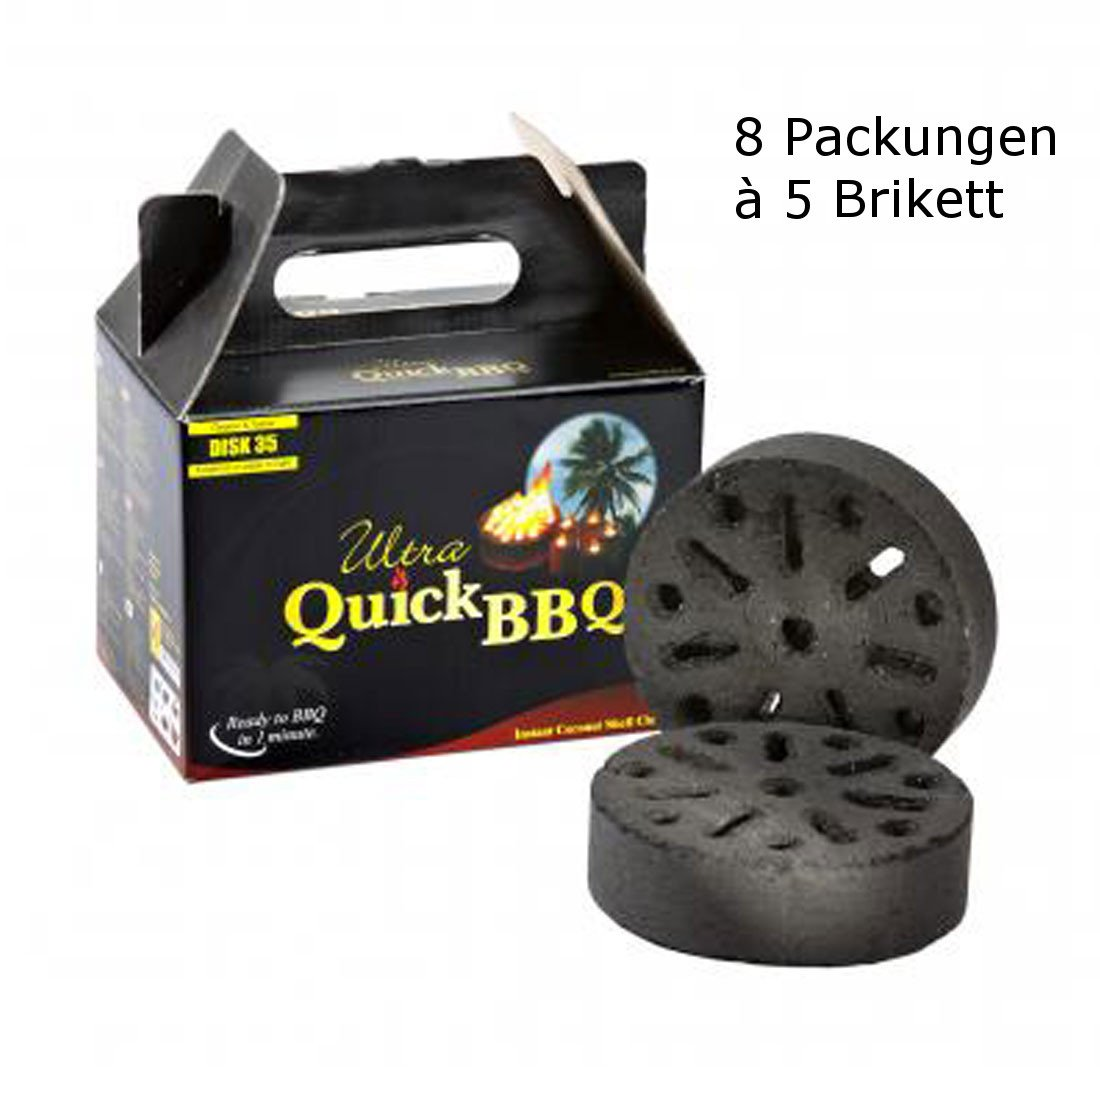 Cobb Scandinavia Quick BQQ Briketts (40 Briketts)